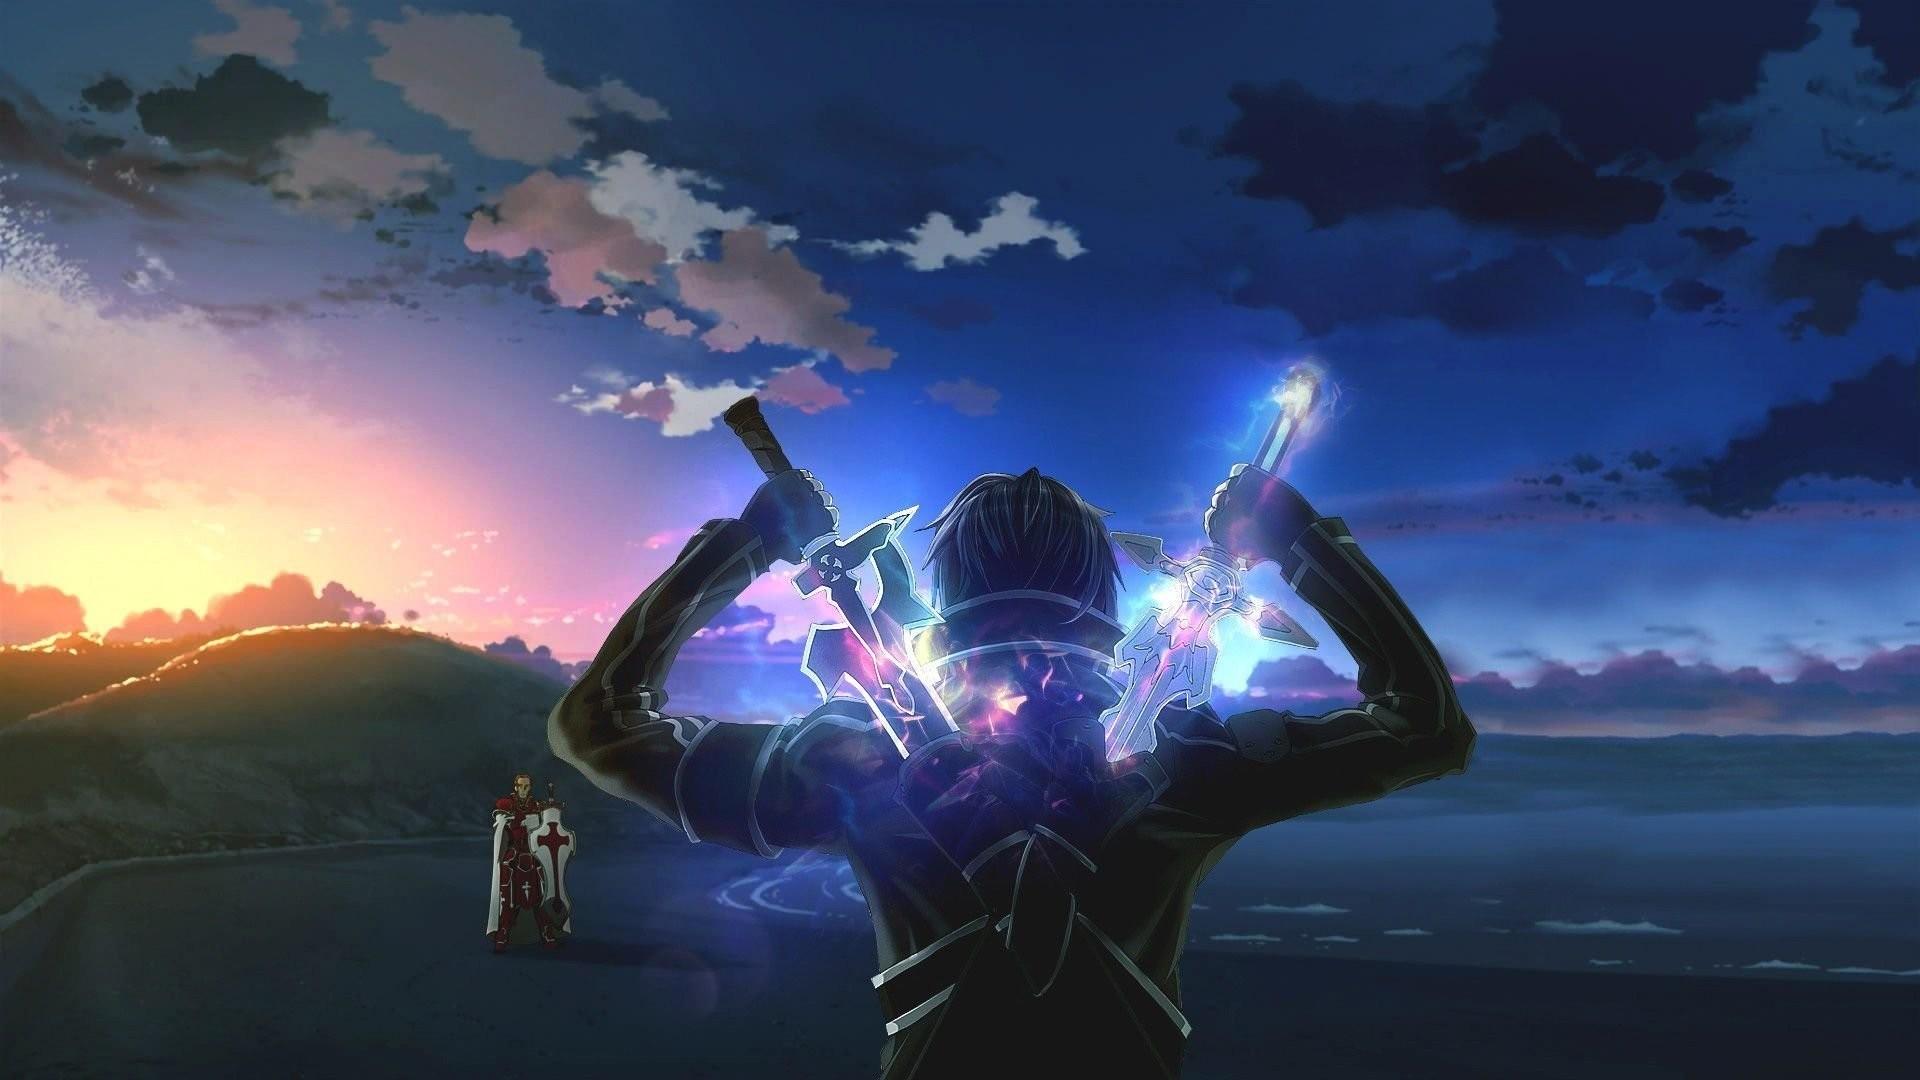 HD Wallpaper | Hintergrund ID:656740. Anime Sword Art Online